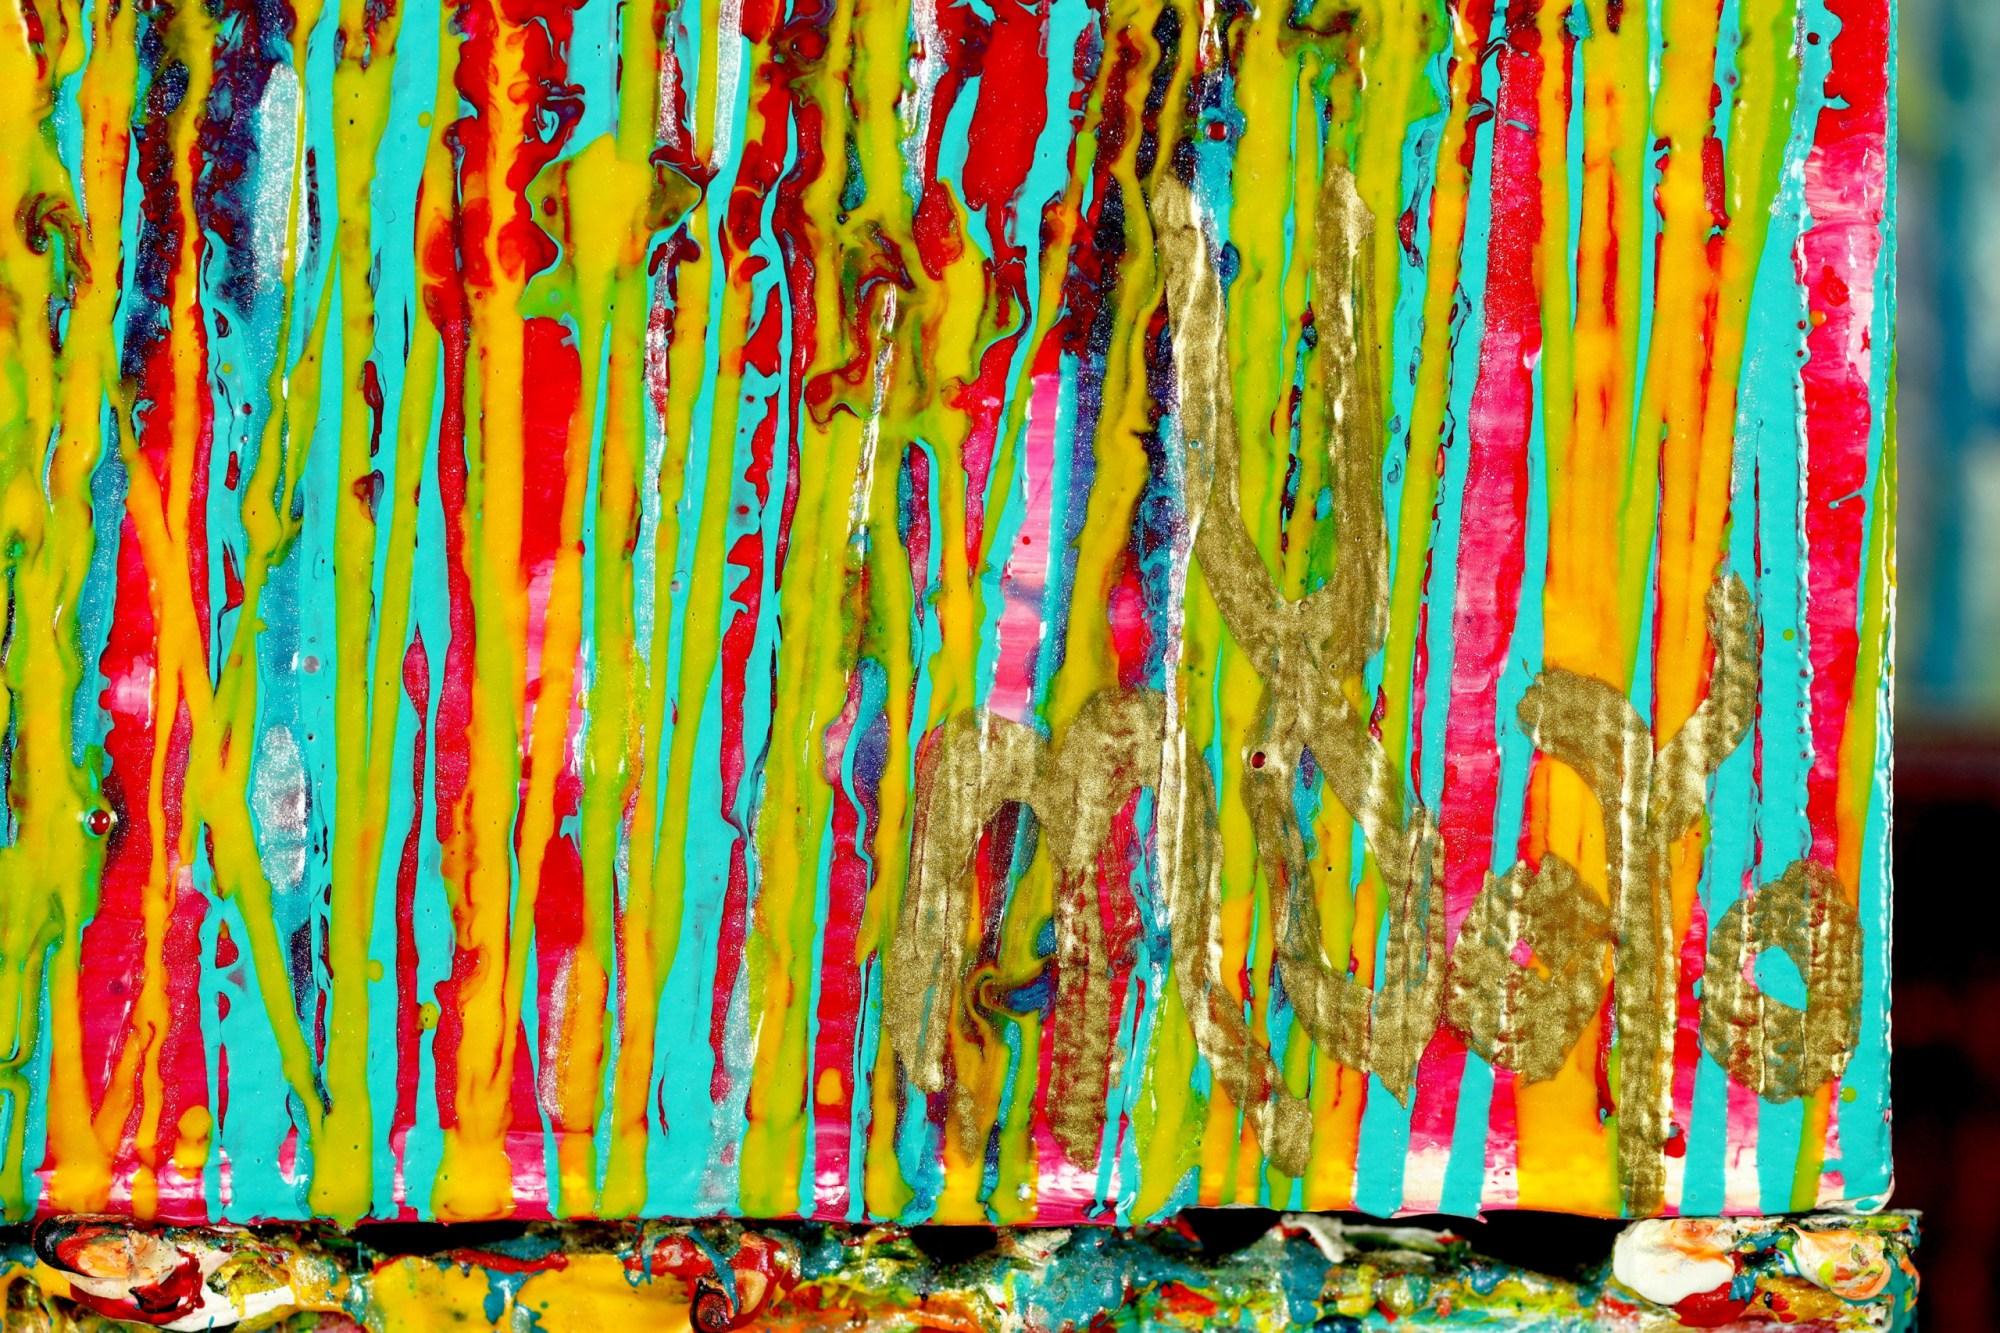 SIGNATURE / Caribbean Reflections 4 (2021) / Artist: Nestor Toro